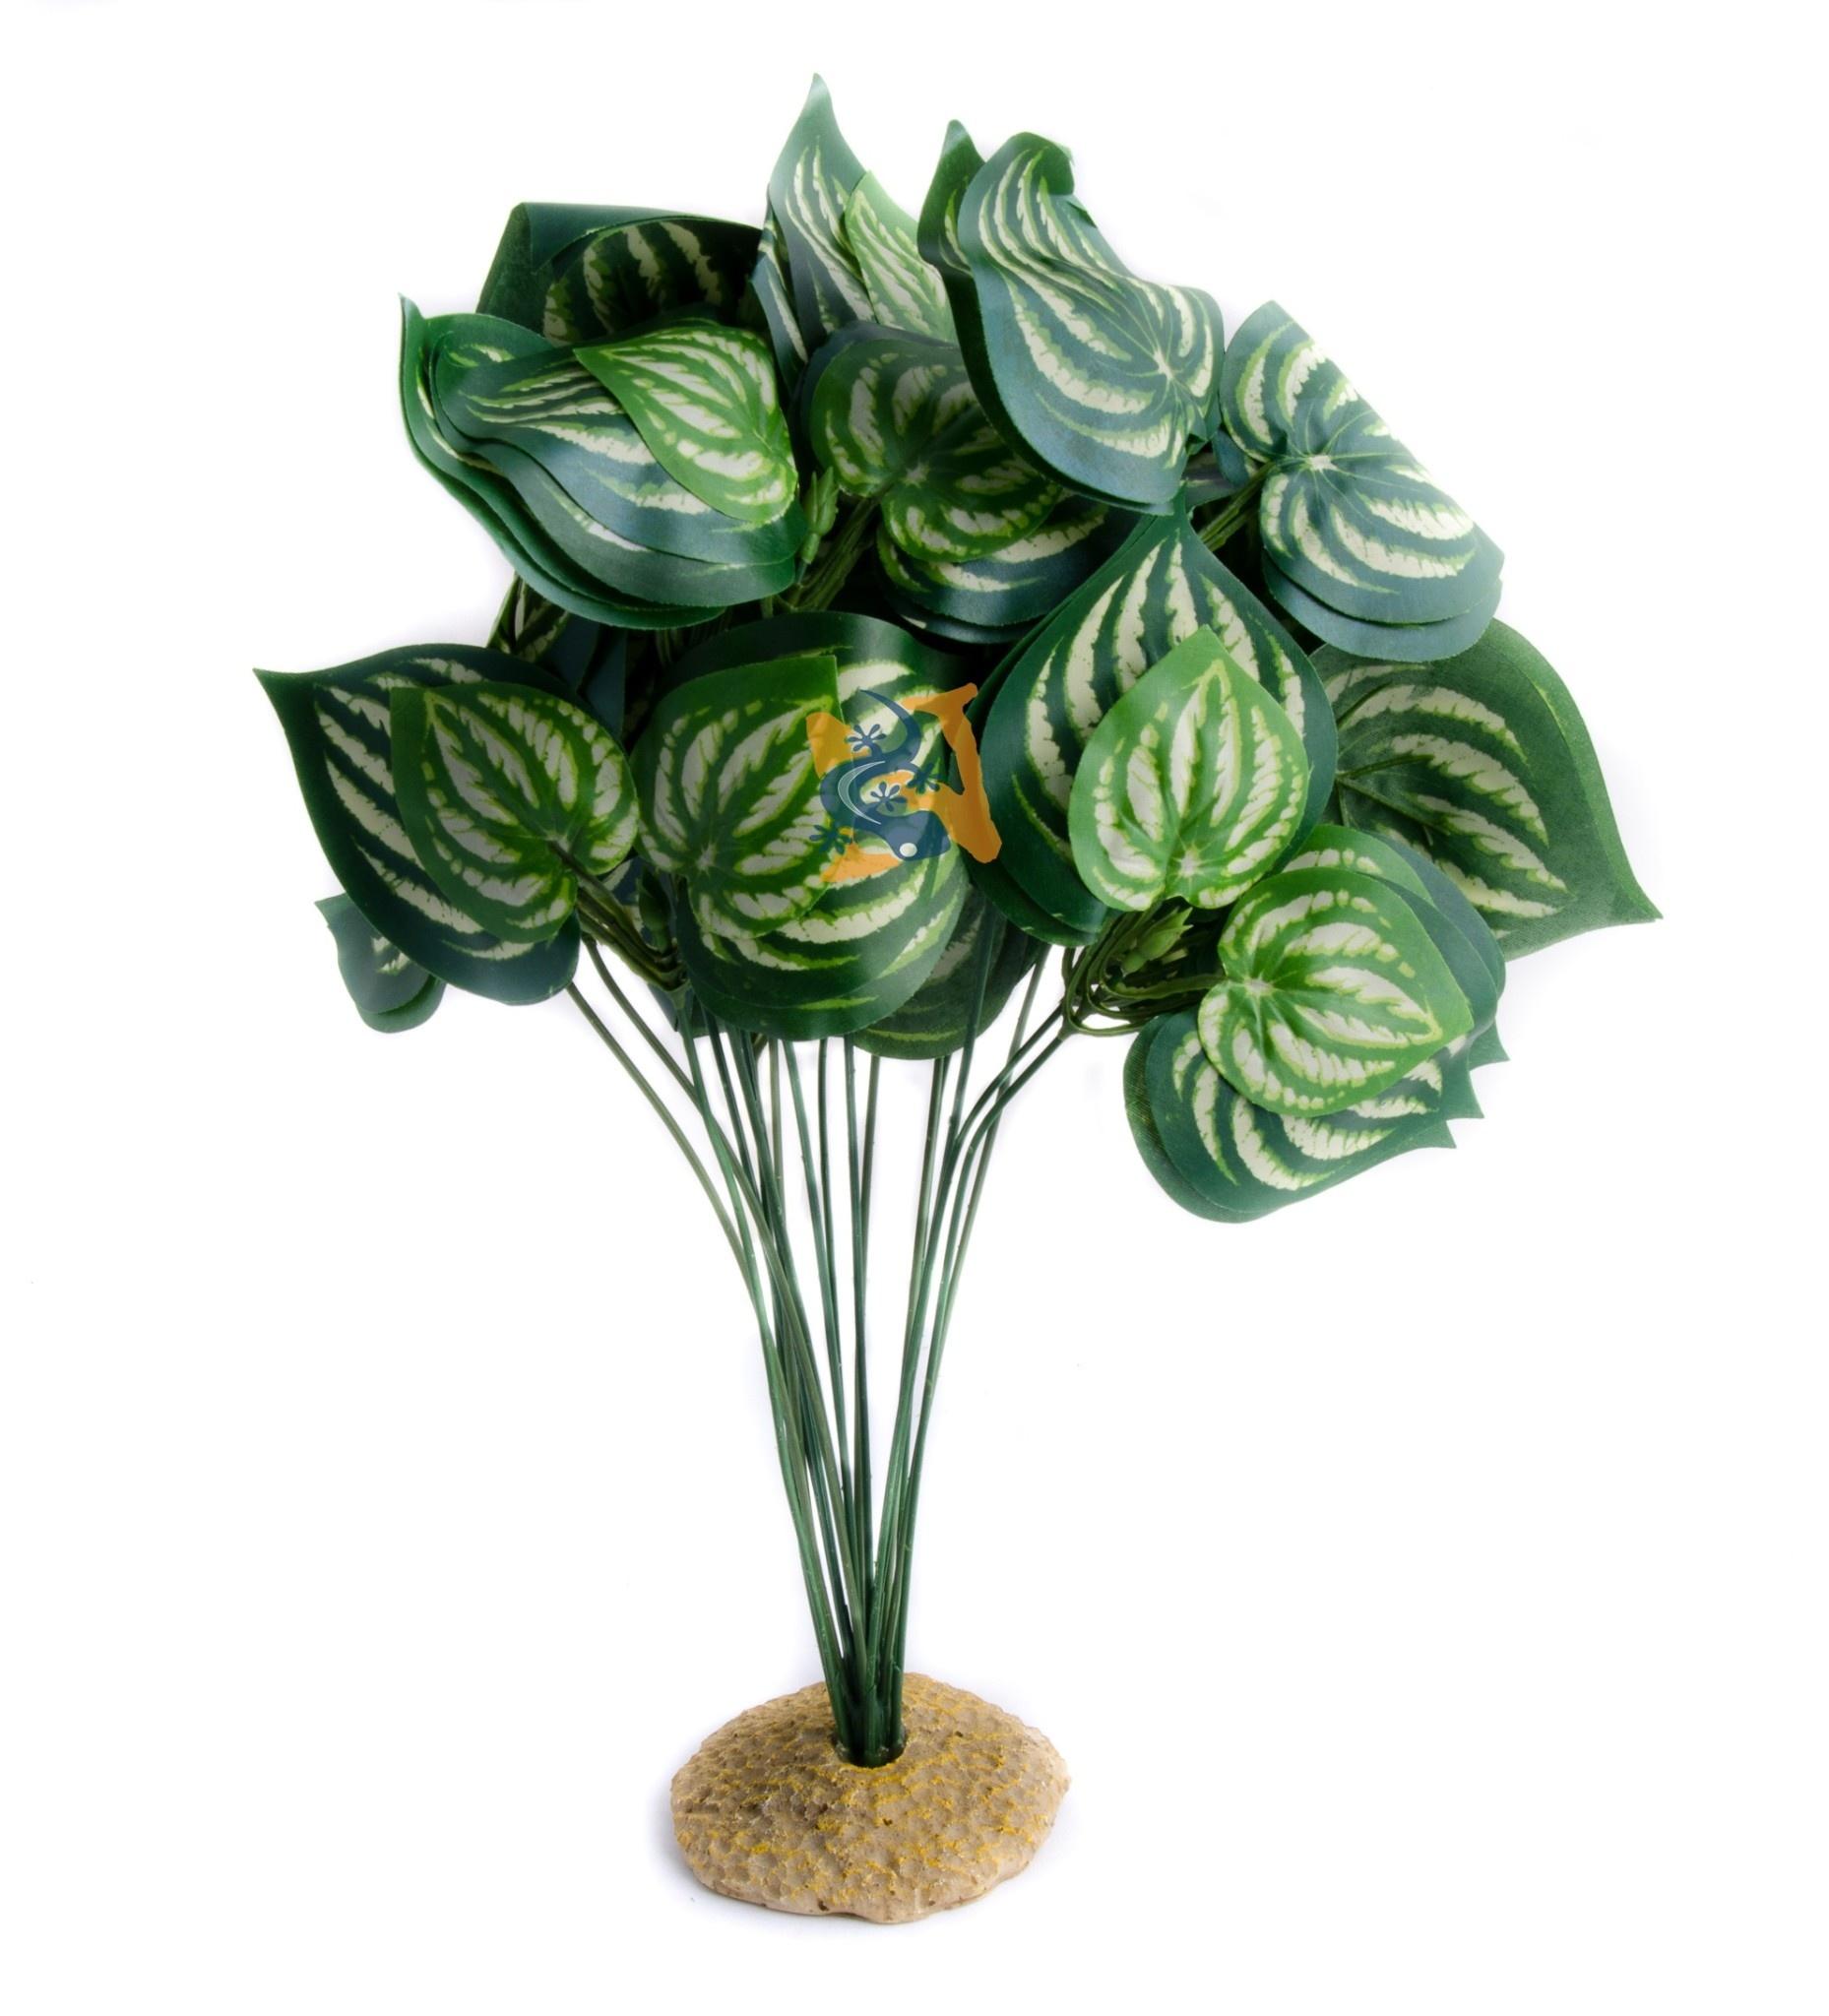 Aqua Globe Plante en soie melon 8 po de haut - Melon Silk Plant